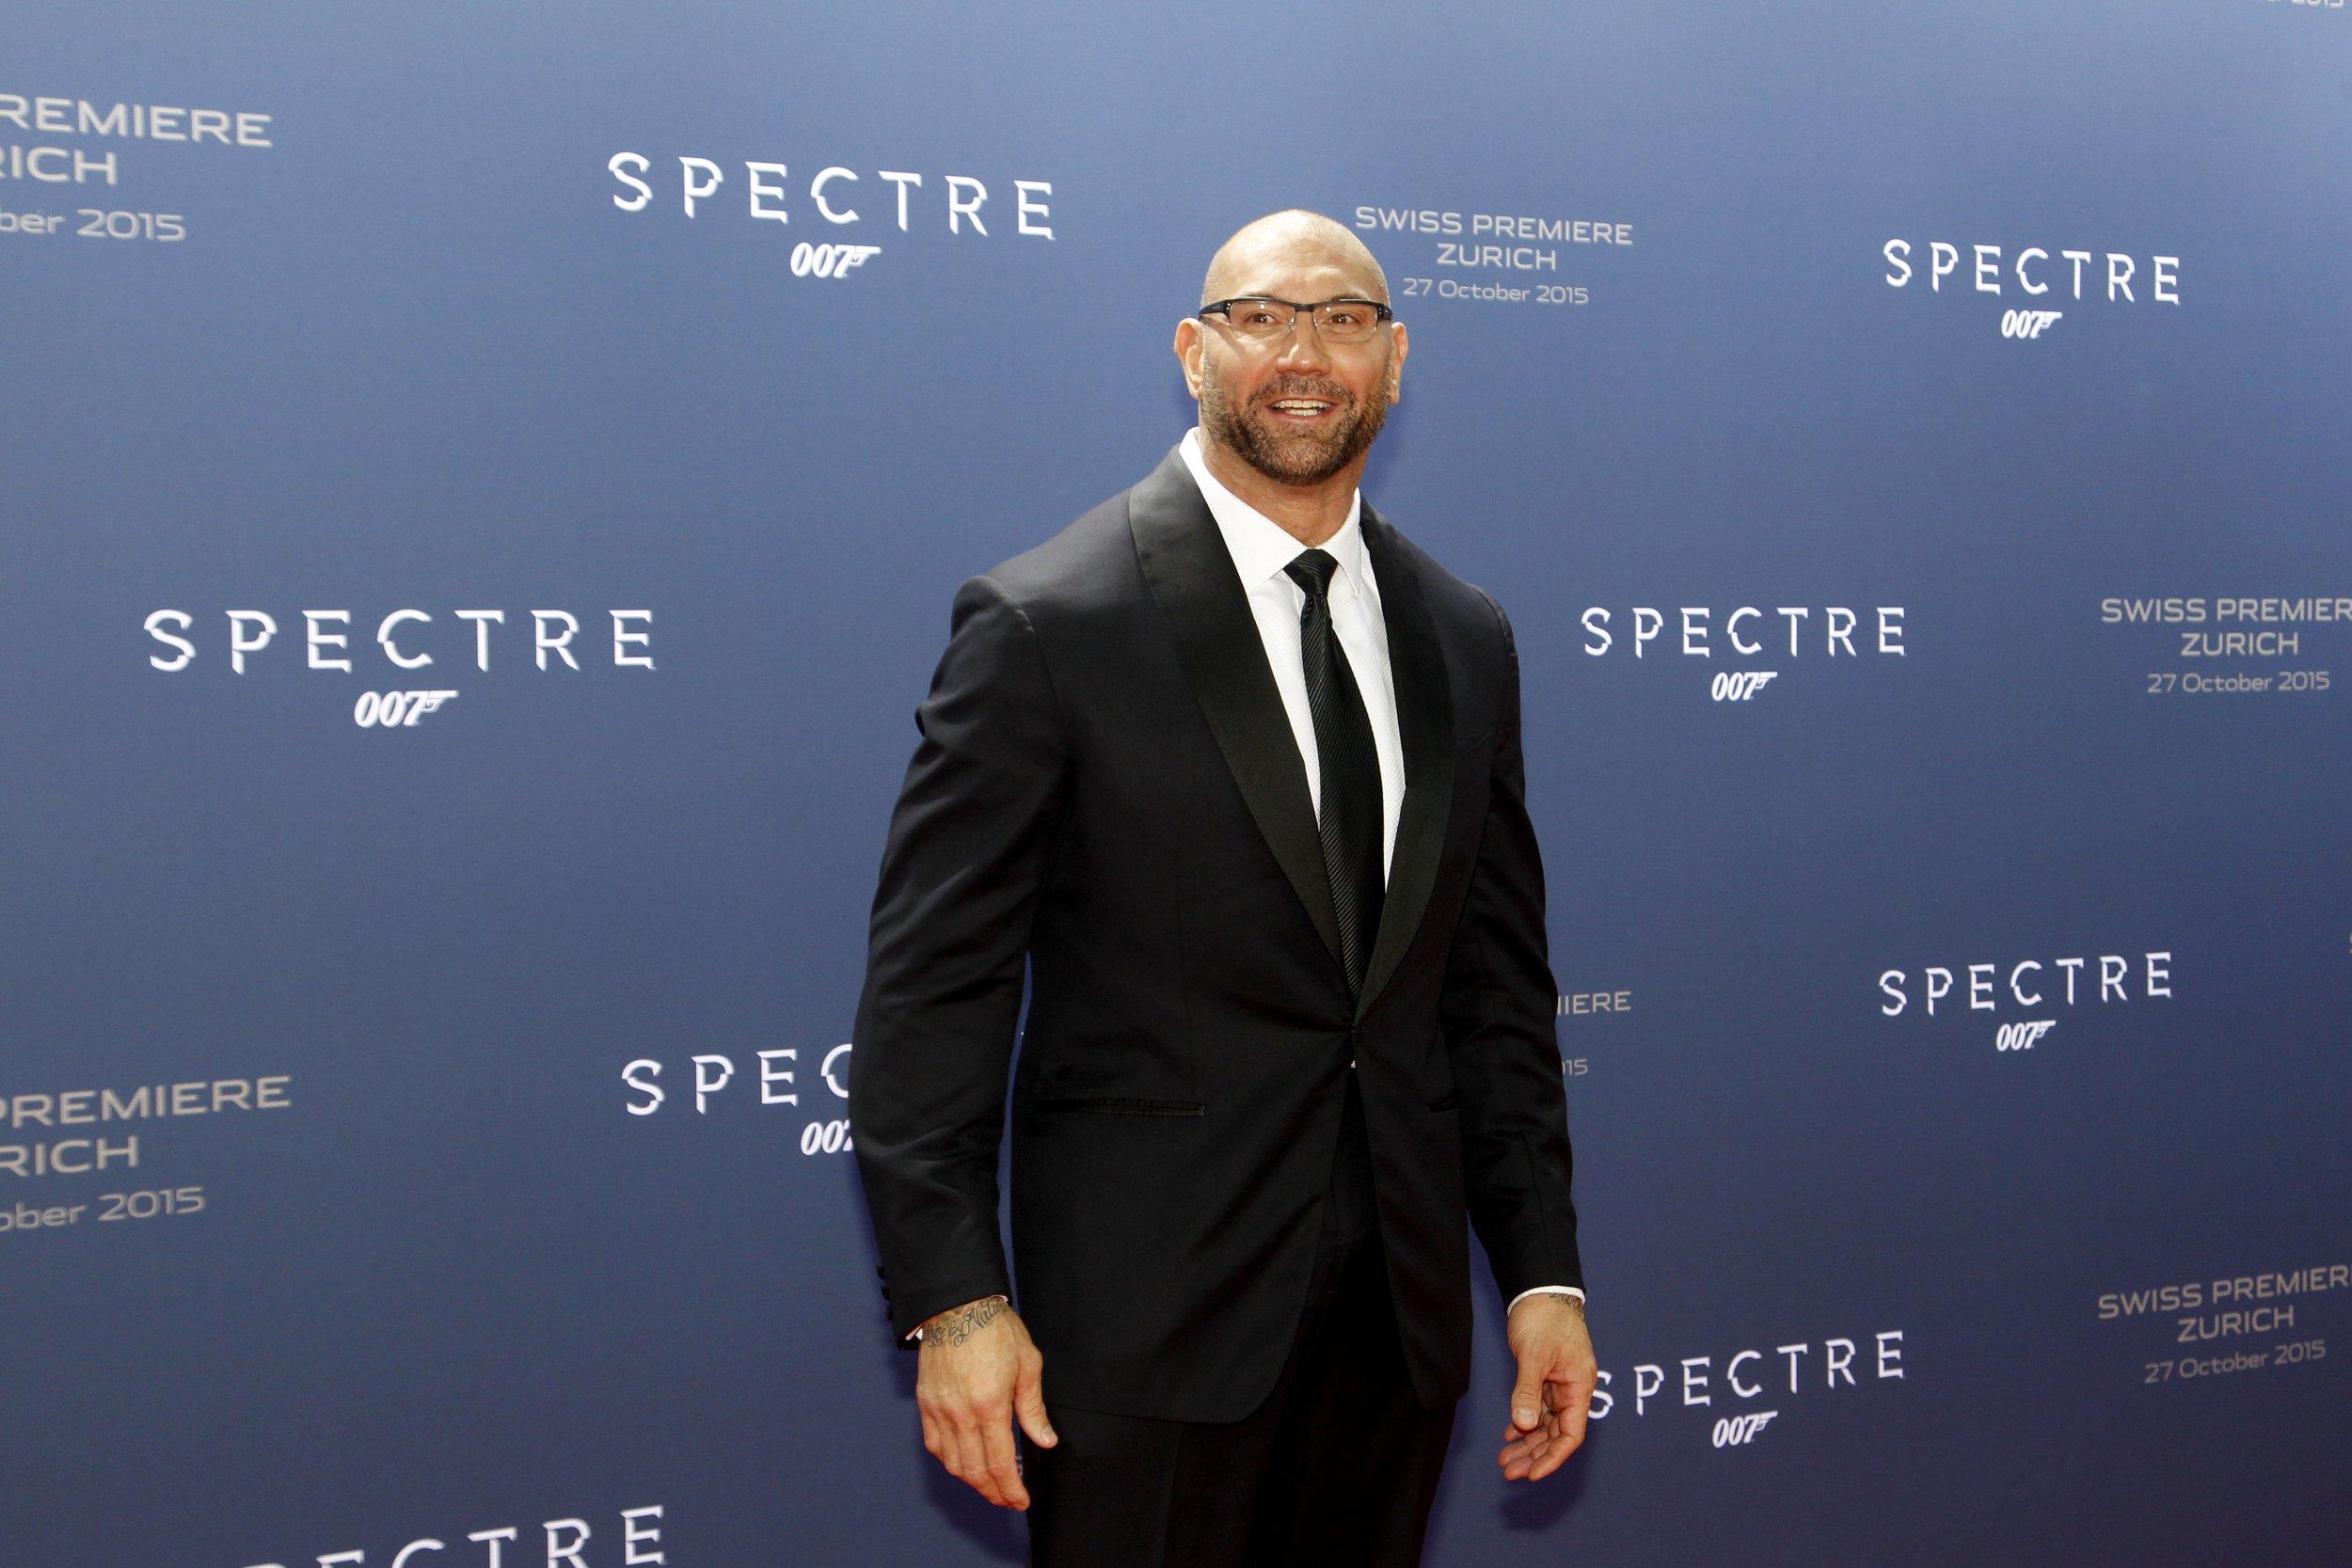 Dave Bautista at SPECTRE premiere